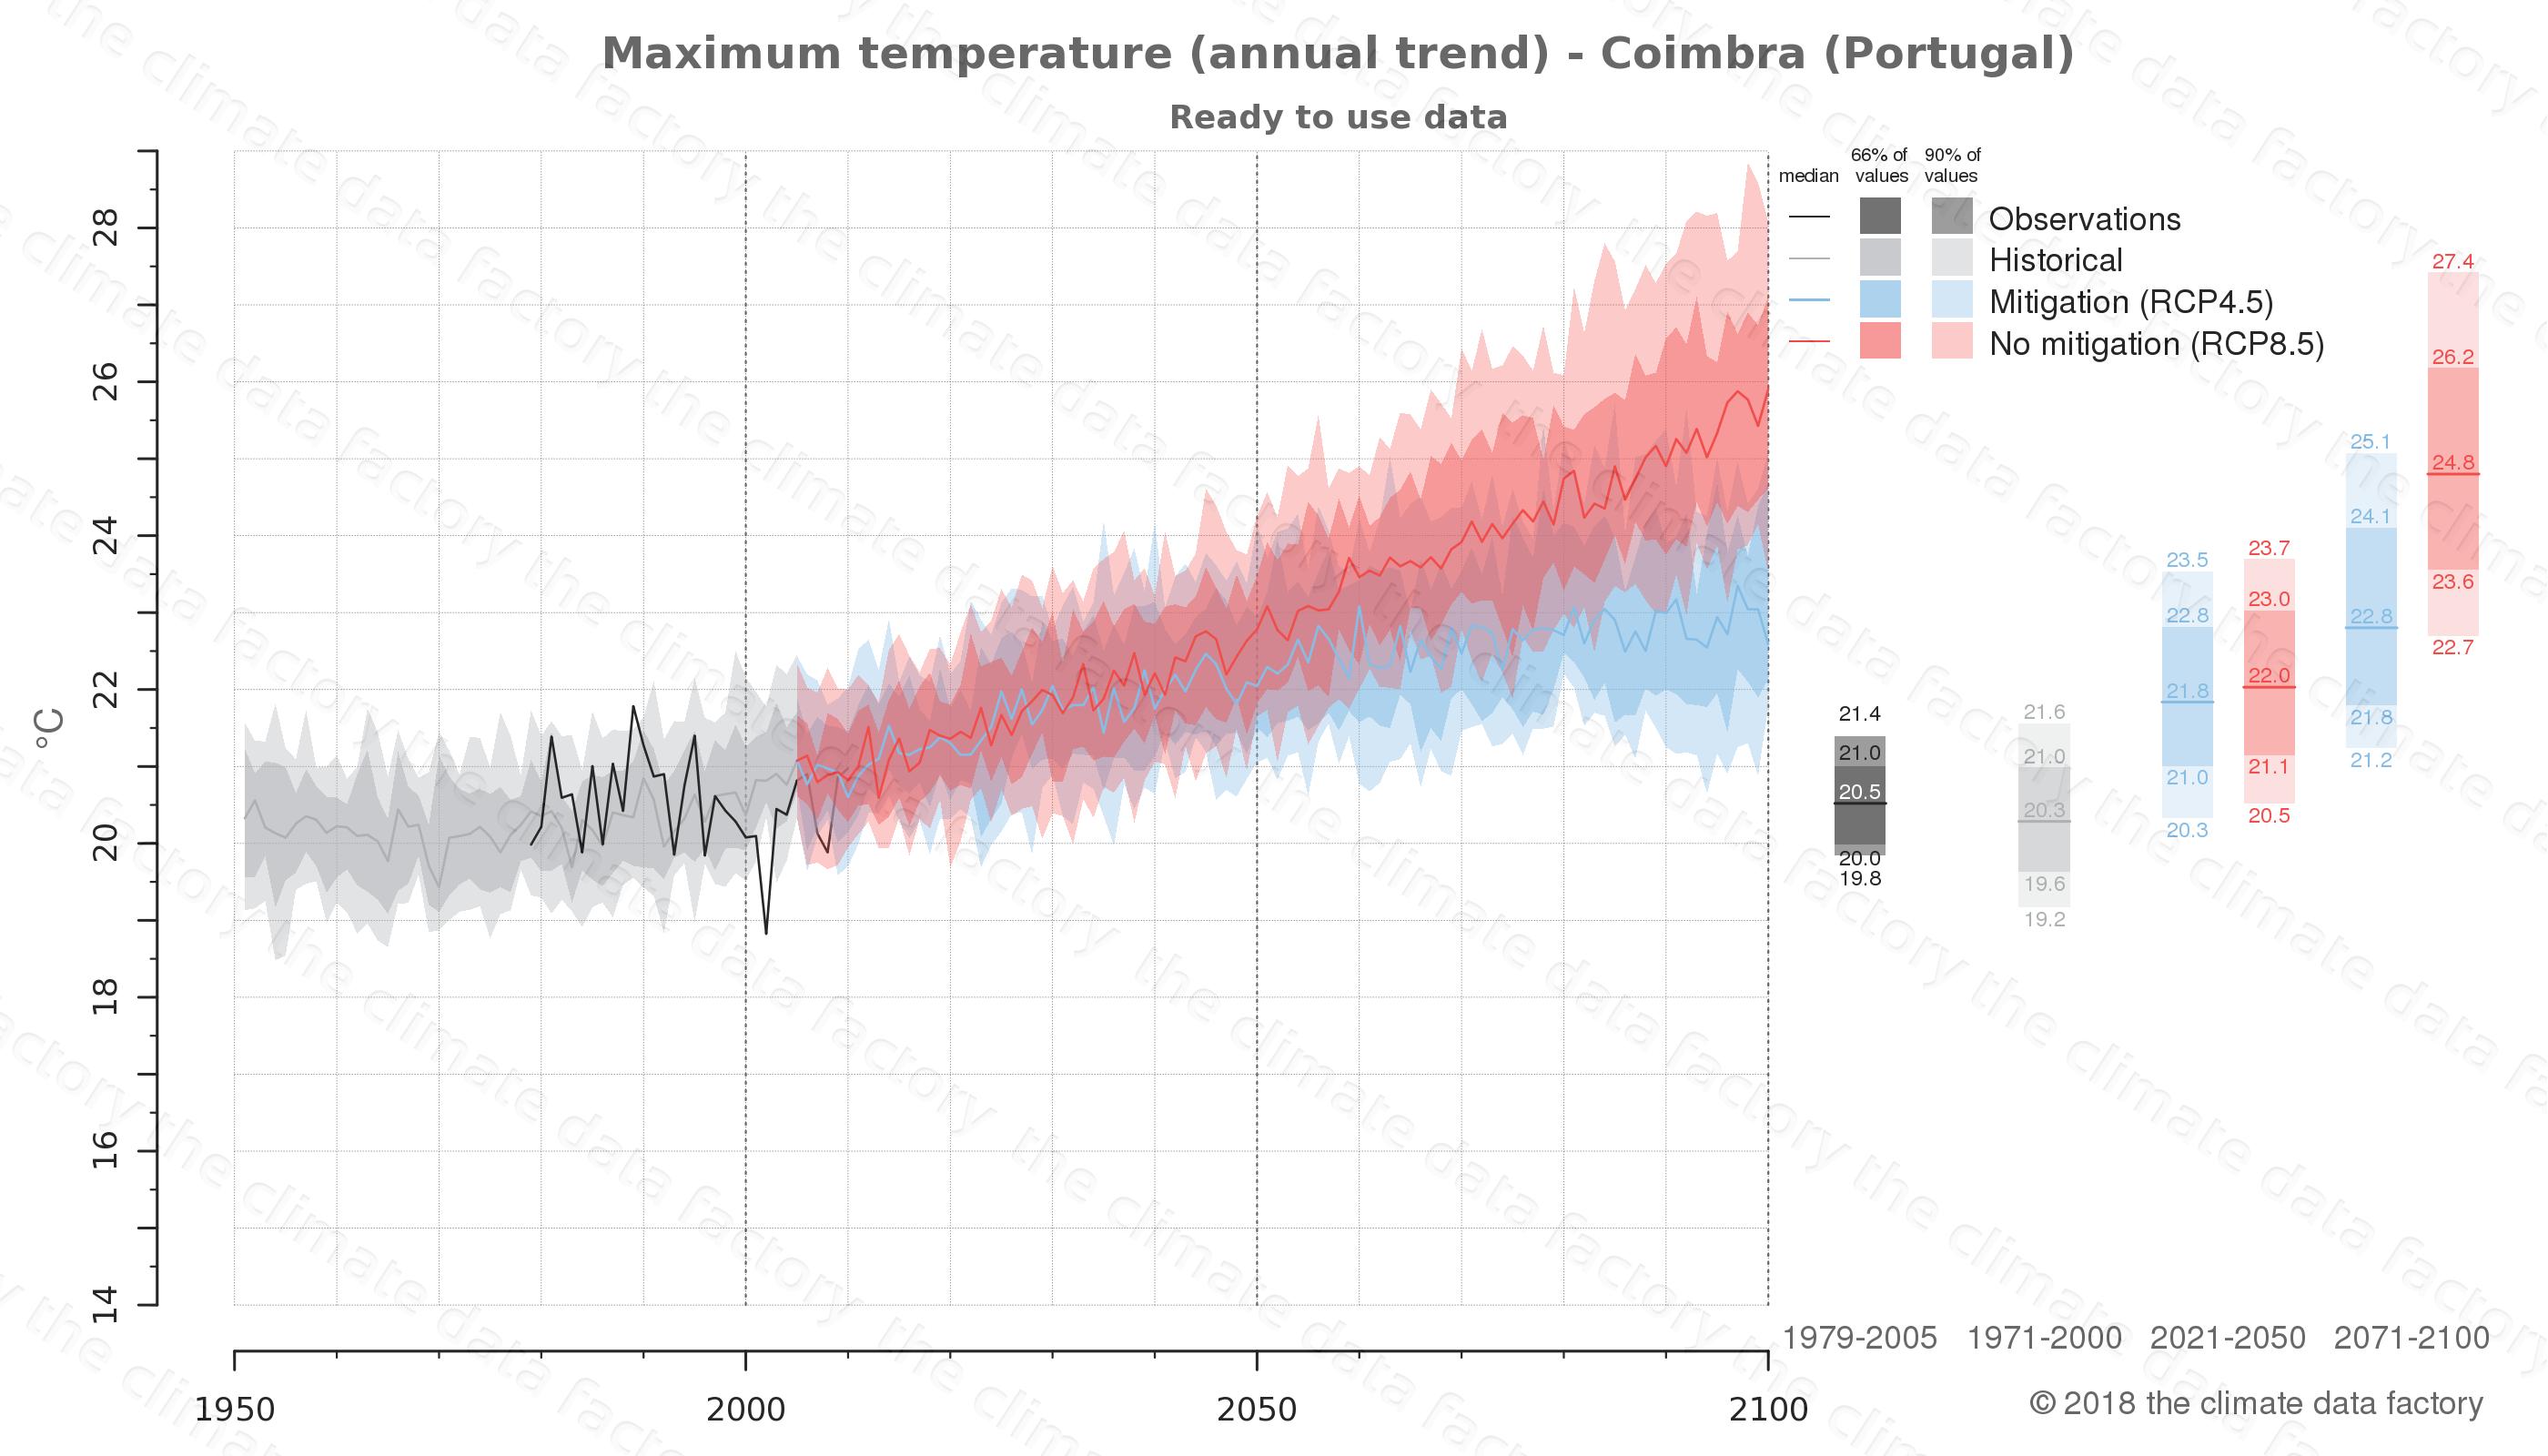 climate change data policy adaptation climate graph city data maximum-temperature coimbra portugal